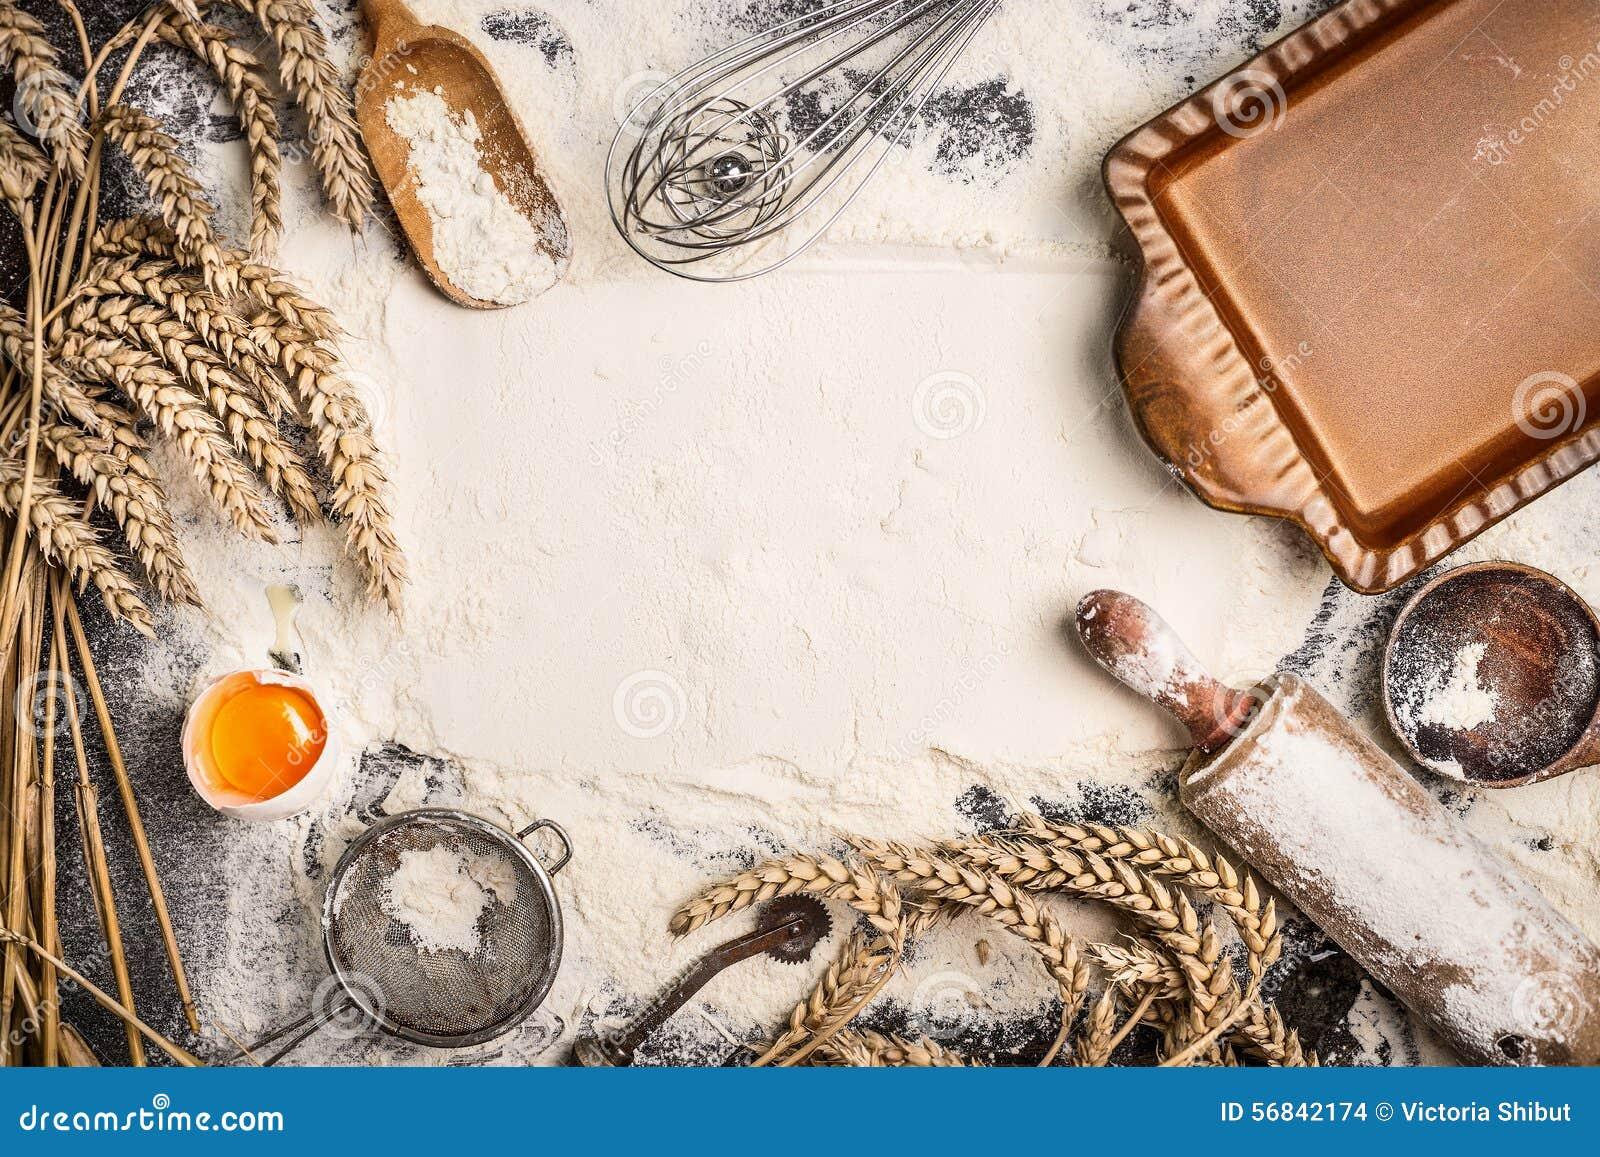 cookie baking business plan